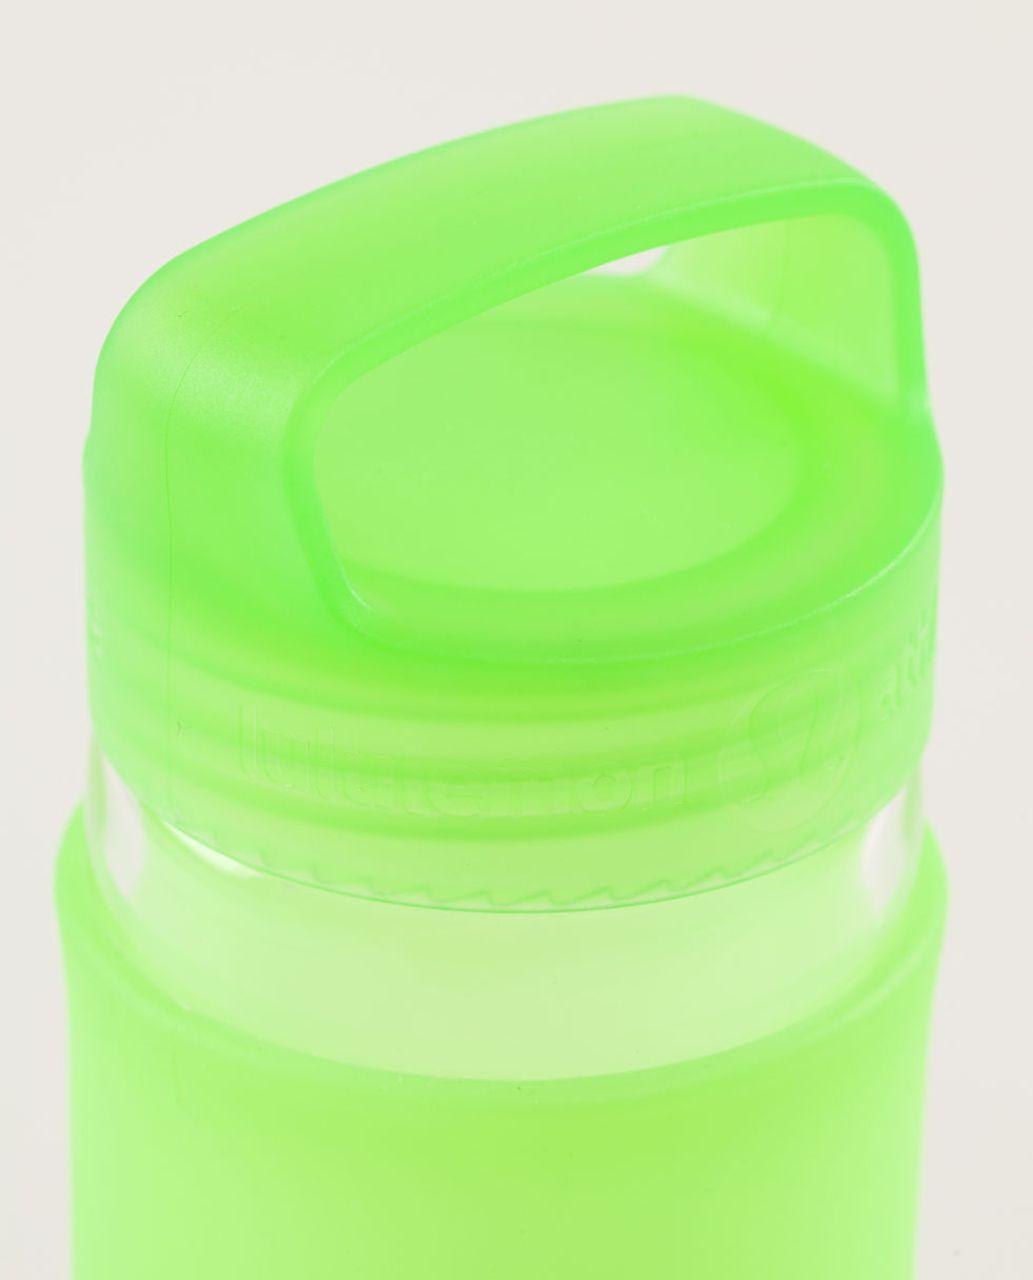 Lululemon Pure Balance Water Bottle - Zippy Green